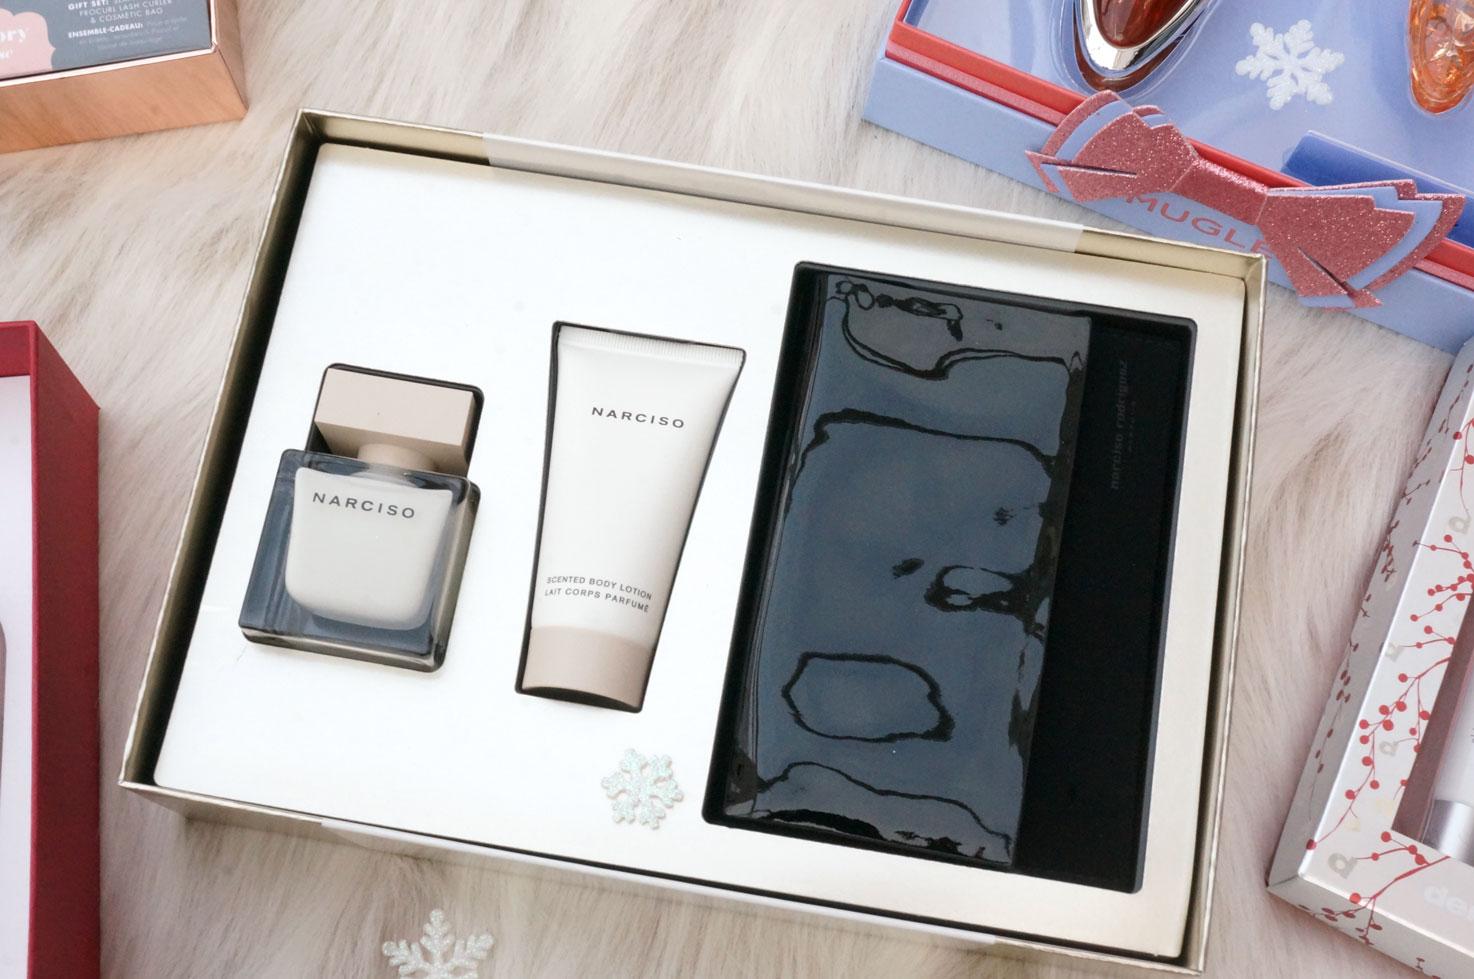 christmas luxury beauty skincare fragrance gift sets thou shalt not covet. Black Bedroom Furniture Sets. Home Design Ideas